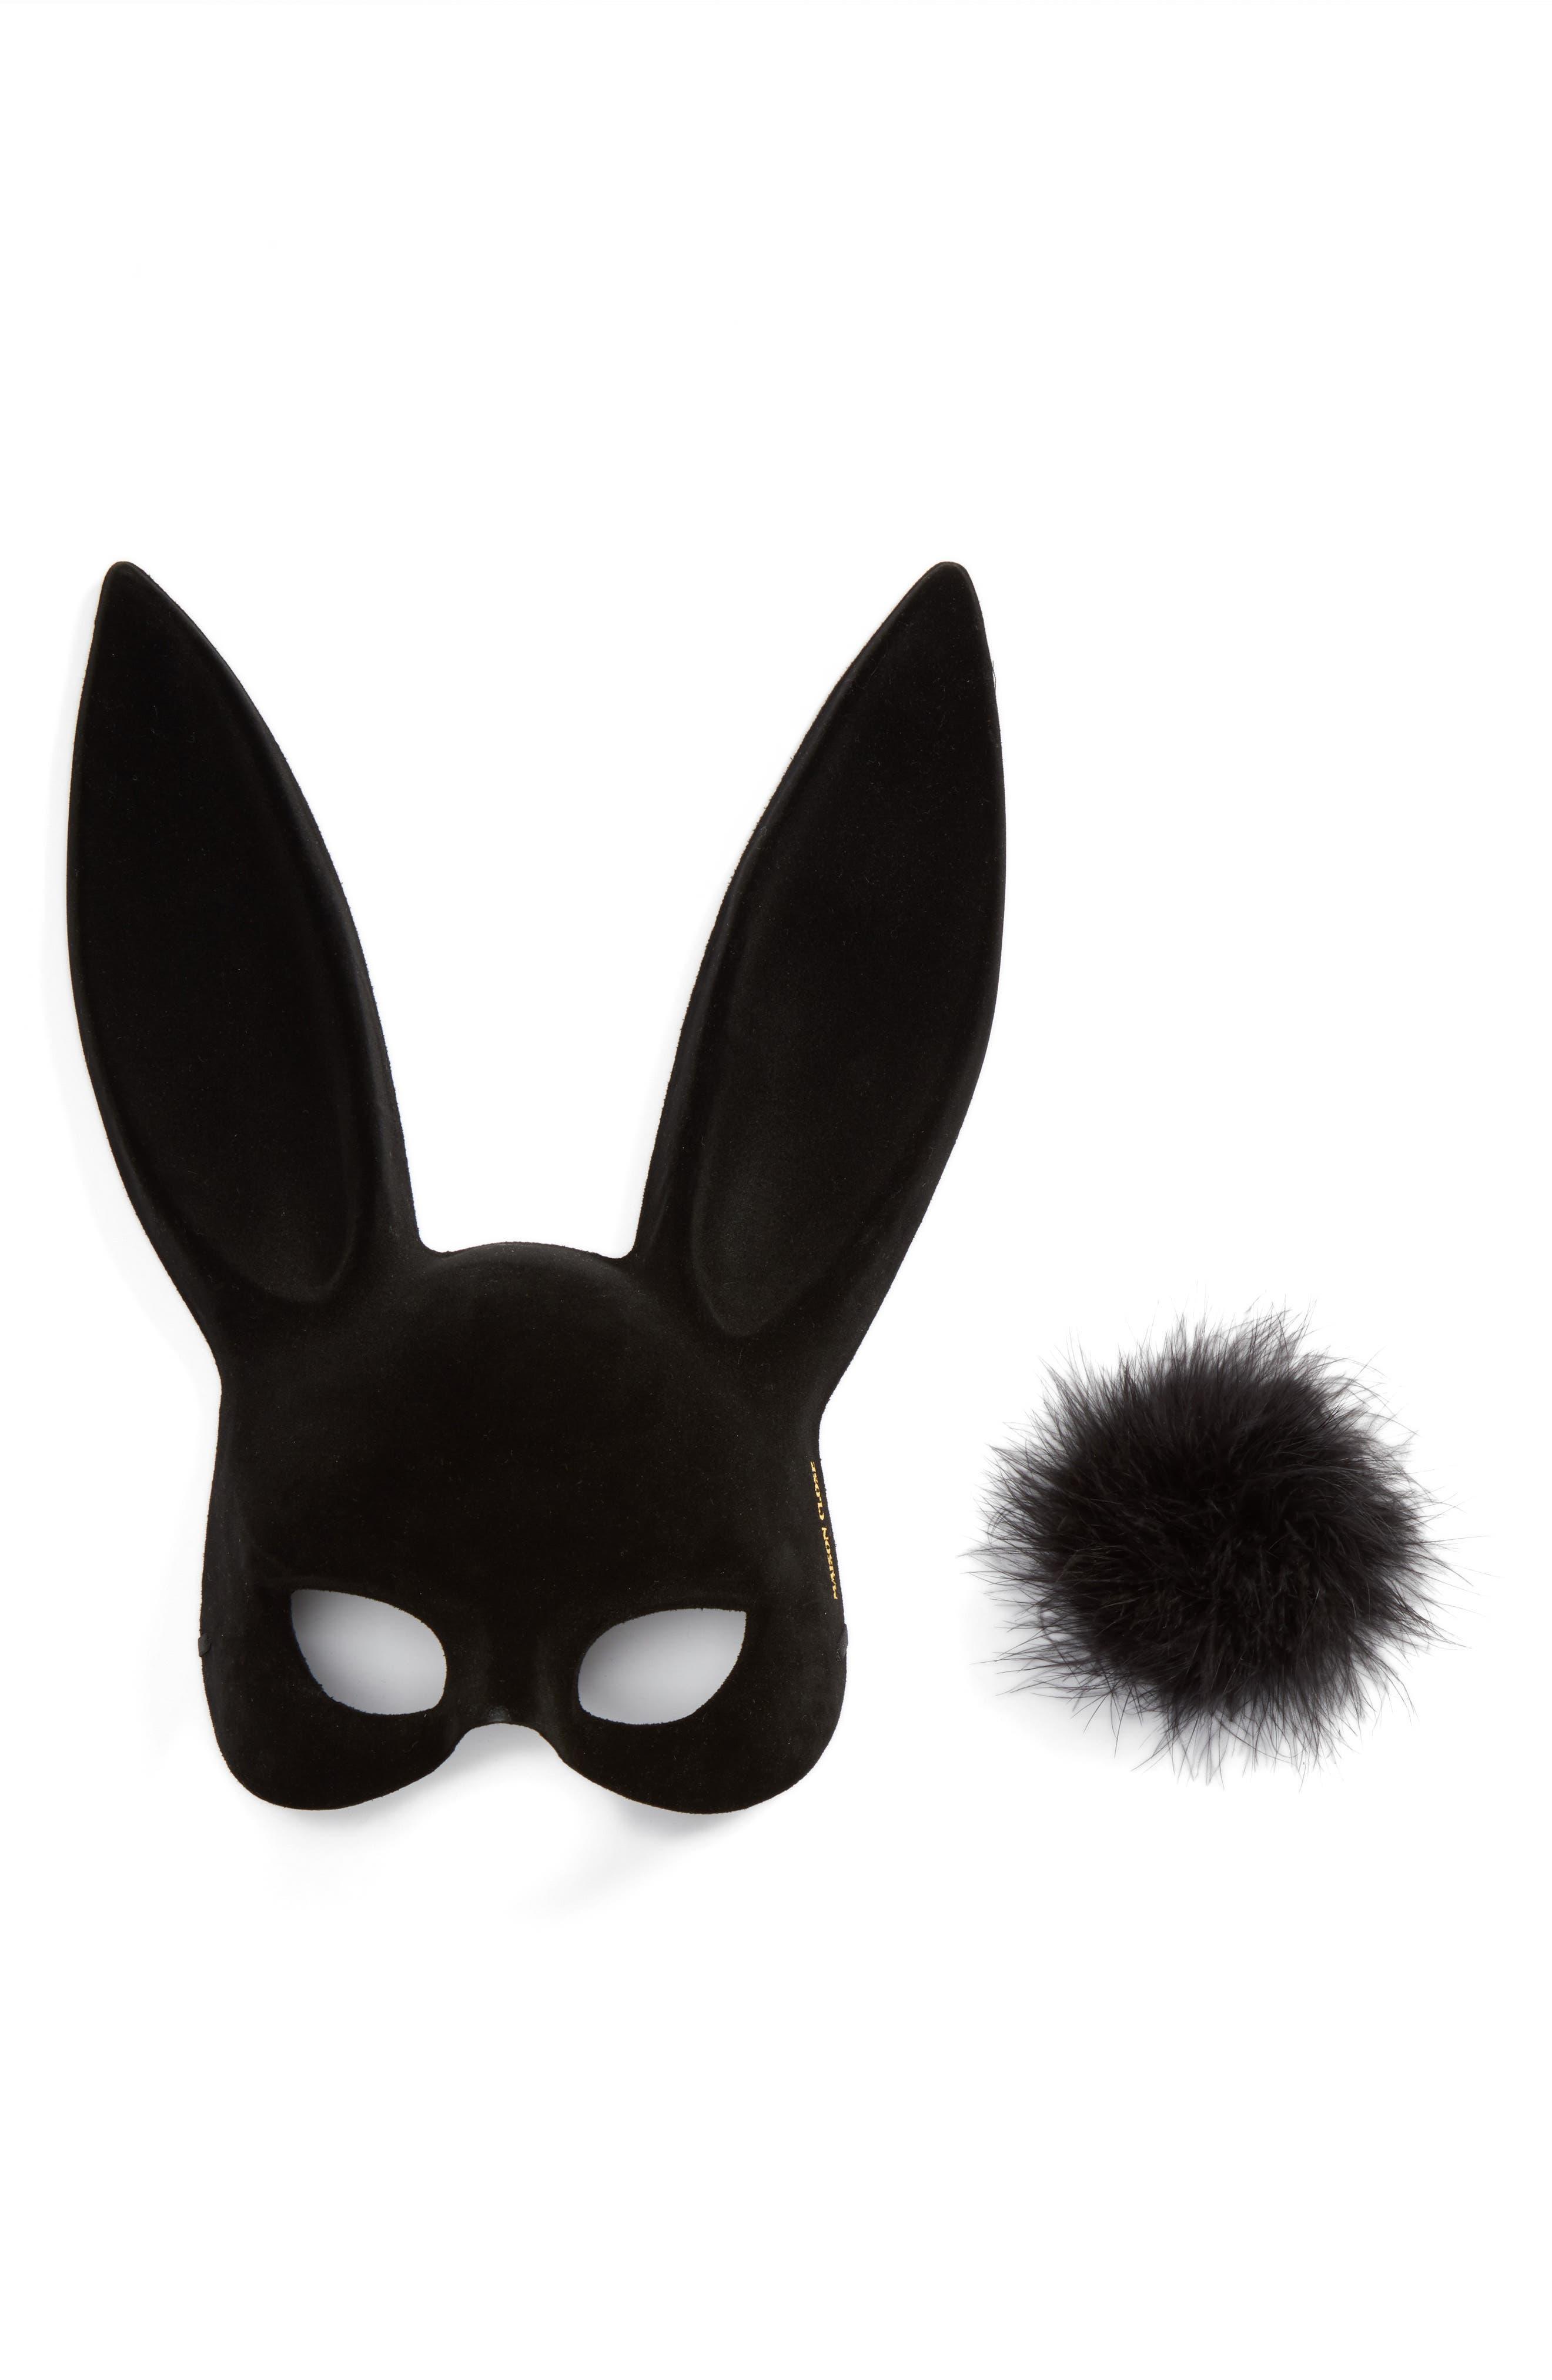 Maison Close Bunny Mask & Tail